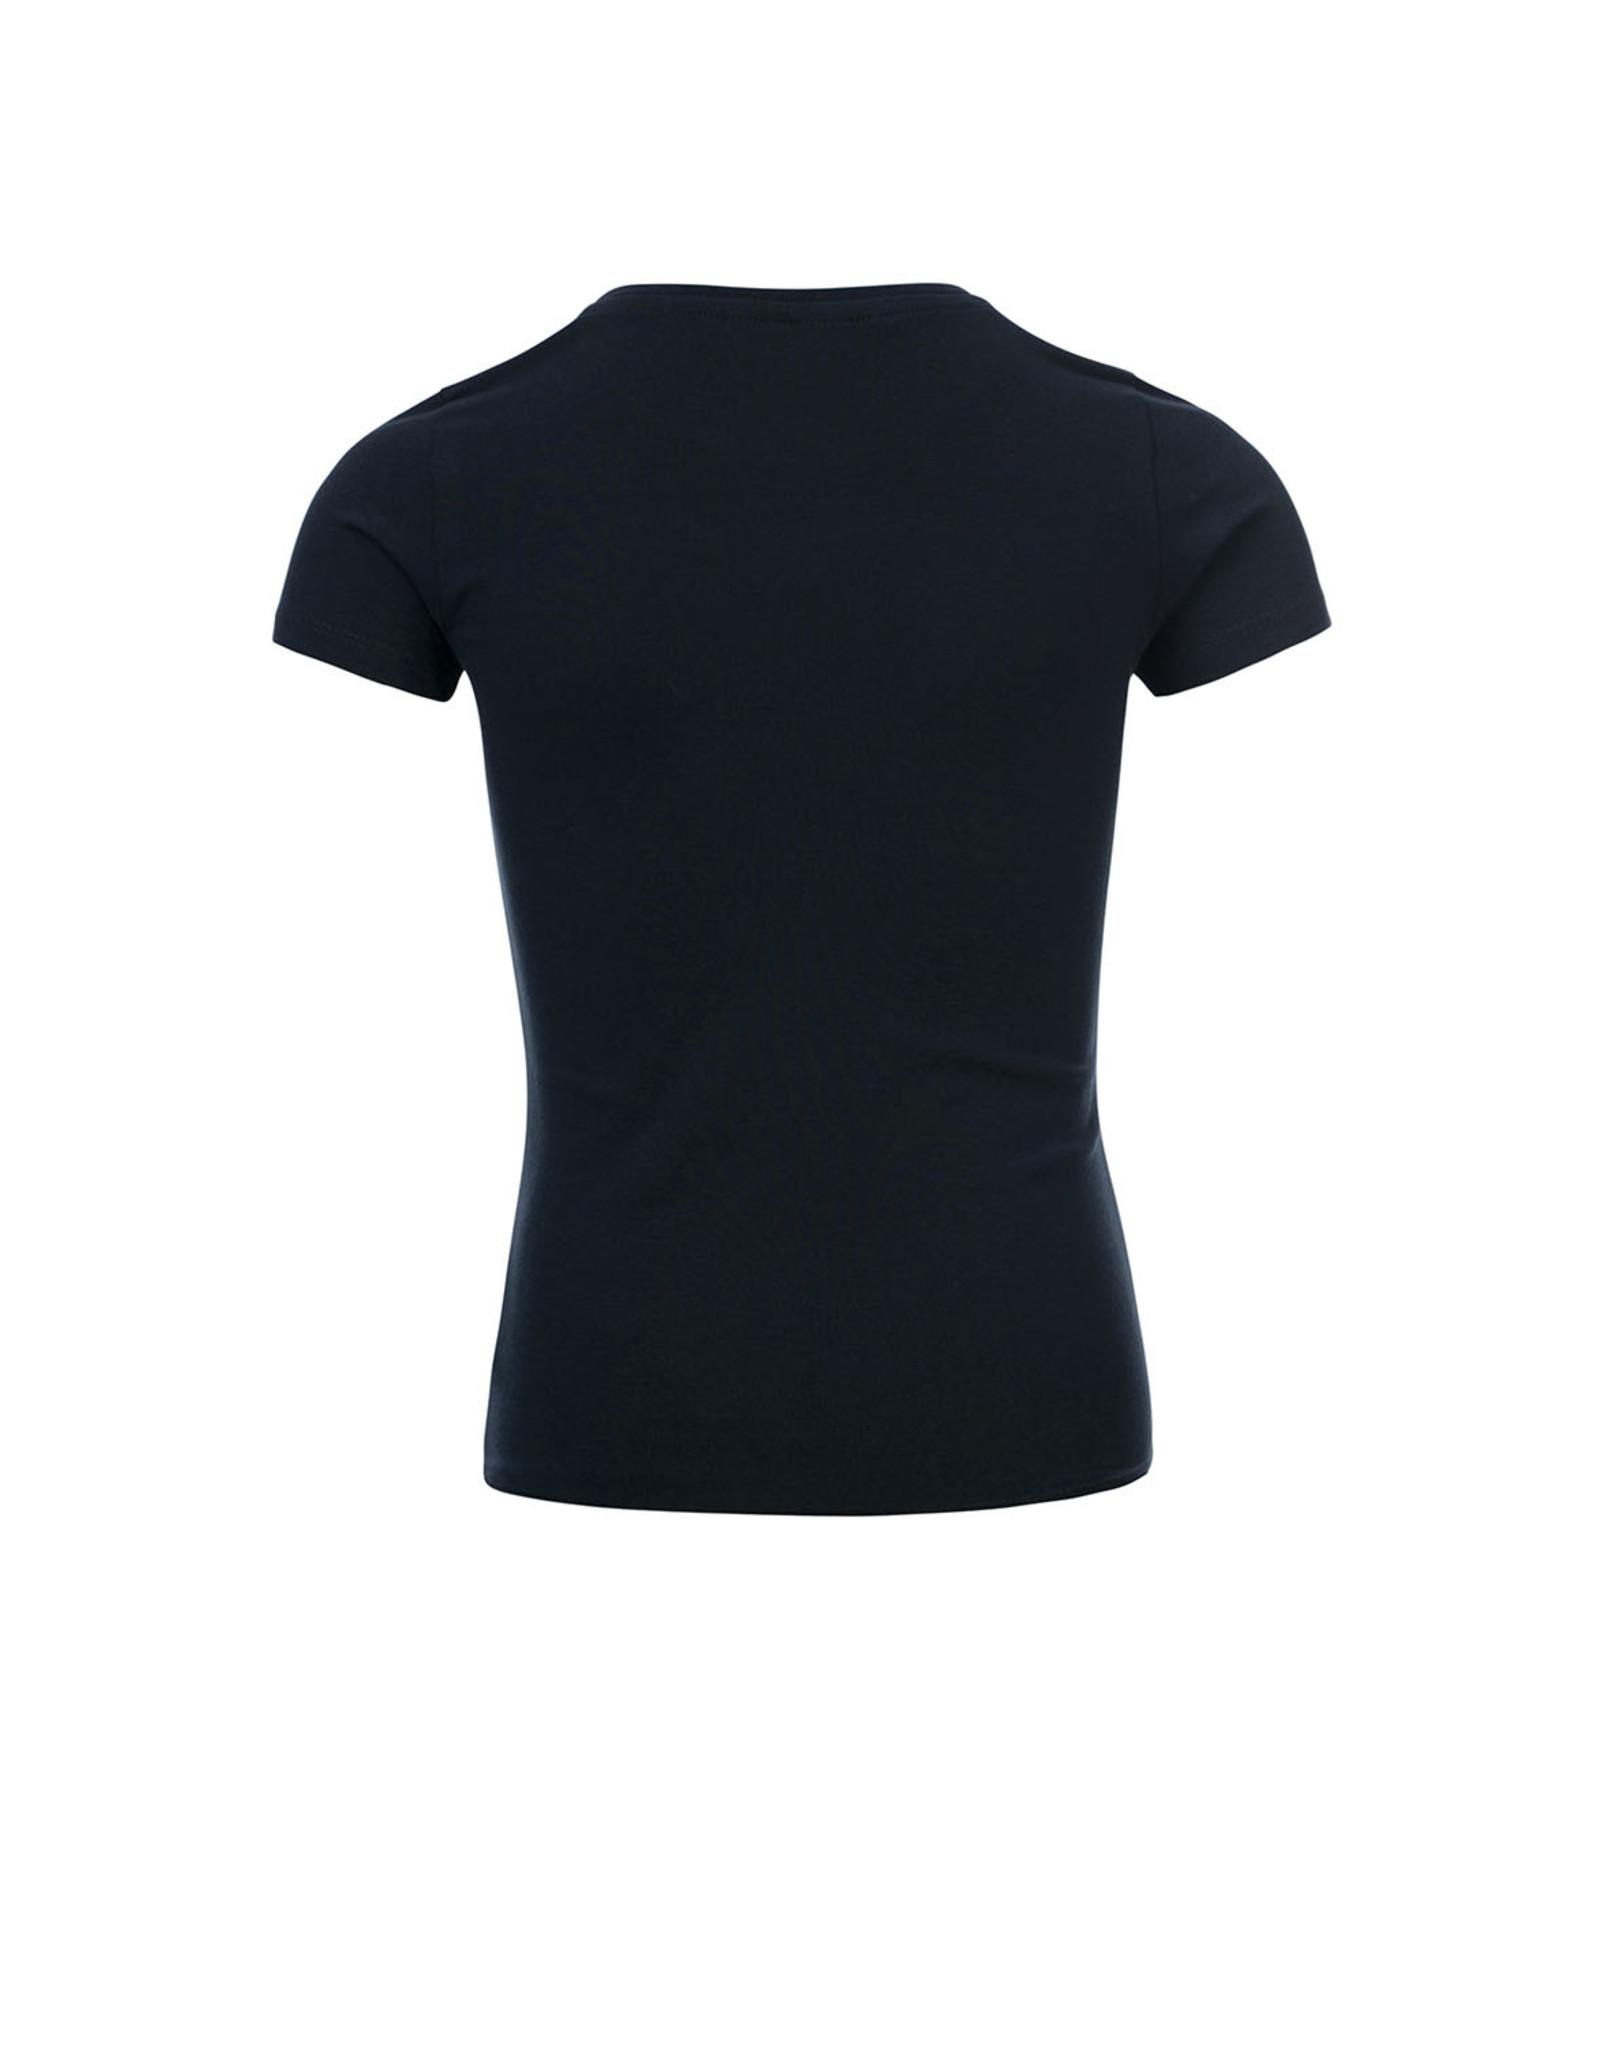 Looxs 10Sixteen T-shirt navy